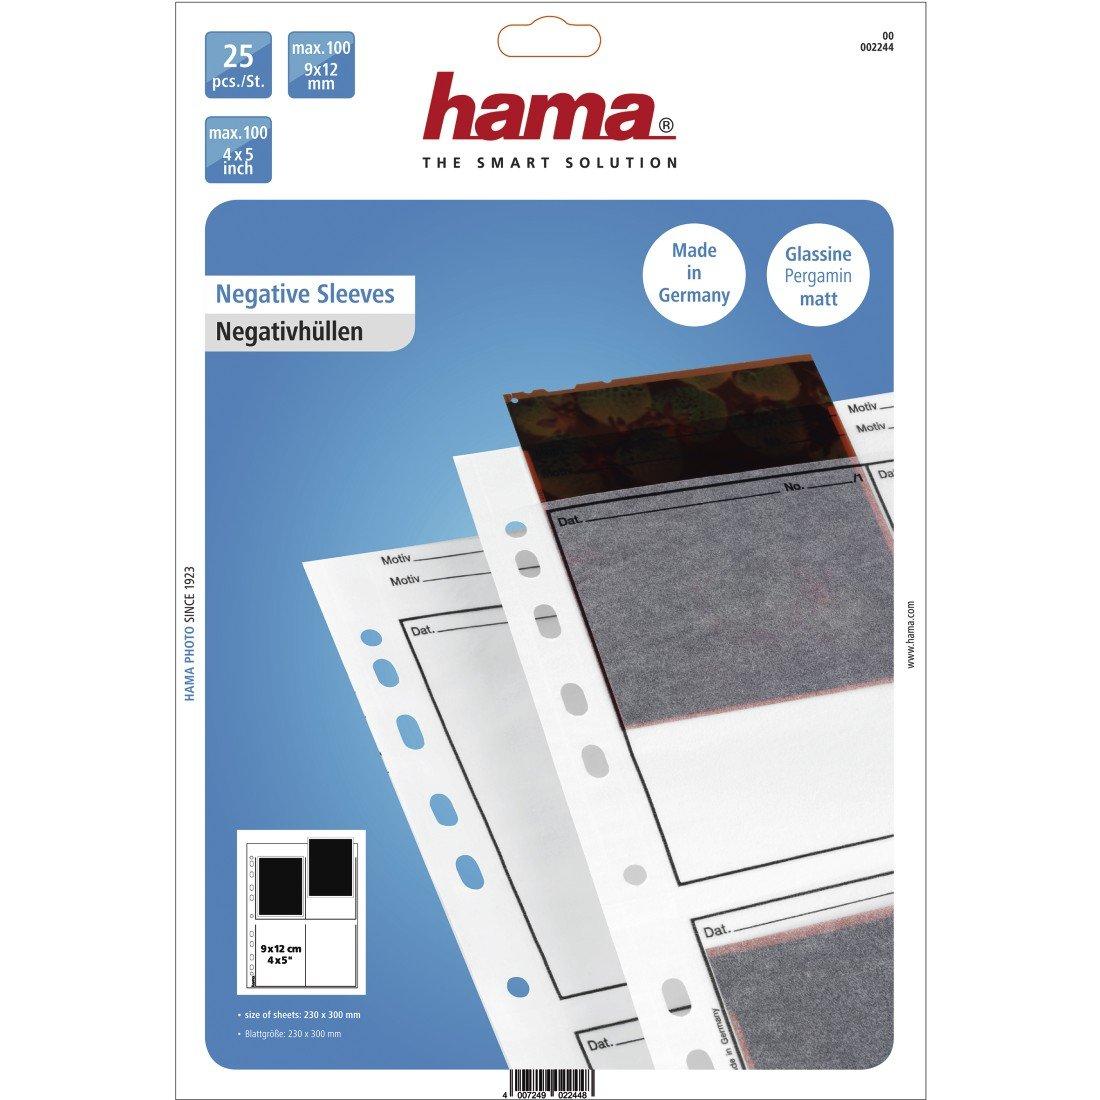 Hama Negative File Storage Sleeves, Each Holding 4 Single 9 x 12 cm Frames, Glassine (Pack of 25) by Hama